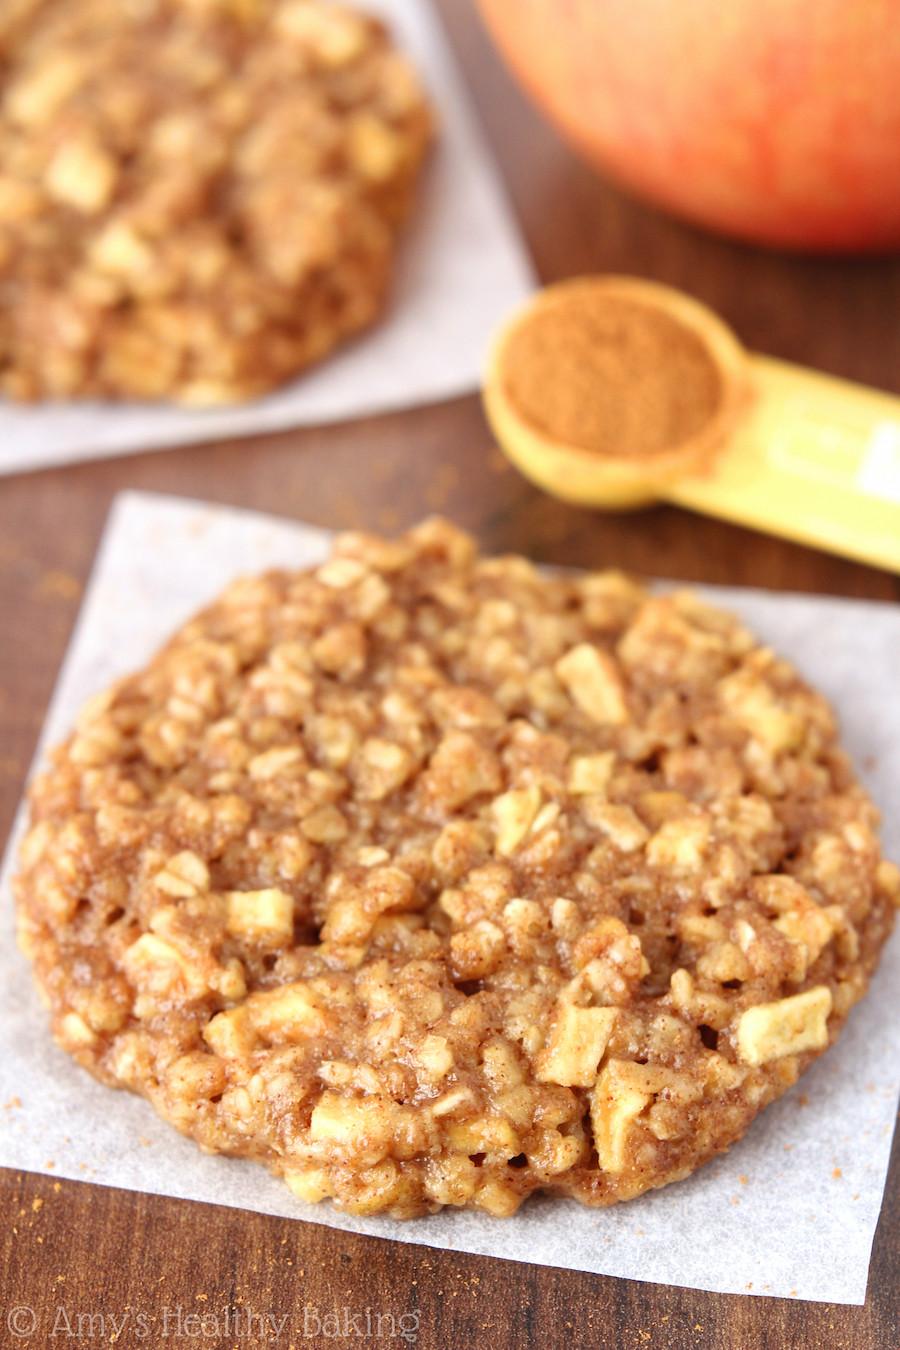 Oatmeal Cookies Recipe Healthy  Peach Pie Oatmeal Cookies